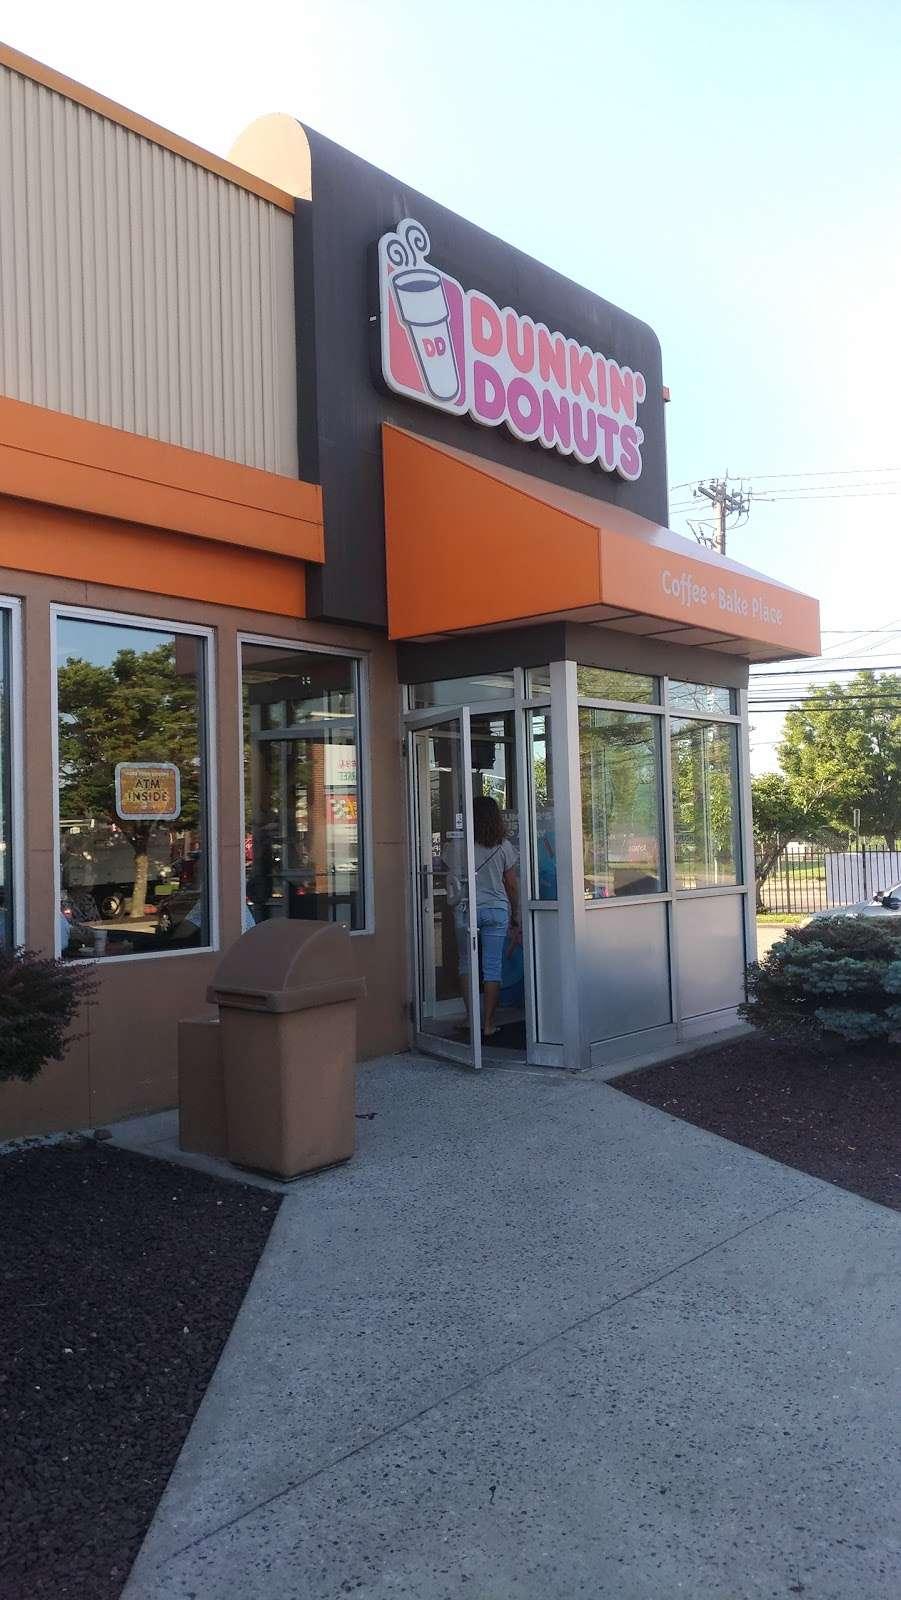 Dunkin Donuts - cafe  | Photo 1 of 10 | Address: 402 Grand St #436, Jersey City, NJ 07302, USA | Phone: (201) 309-0777